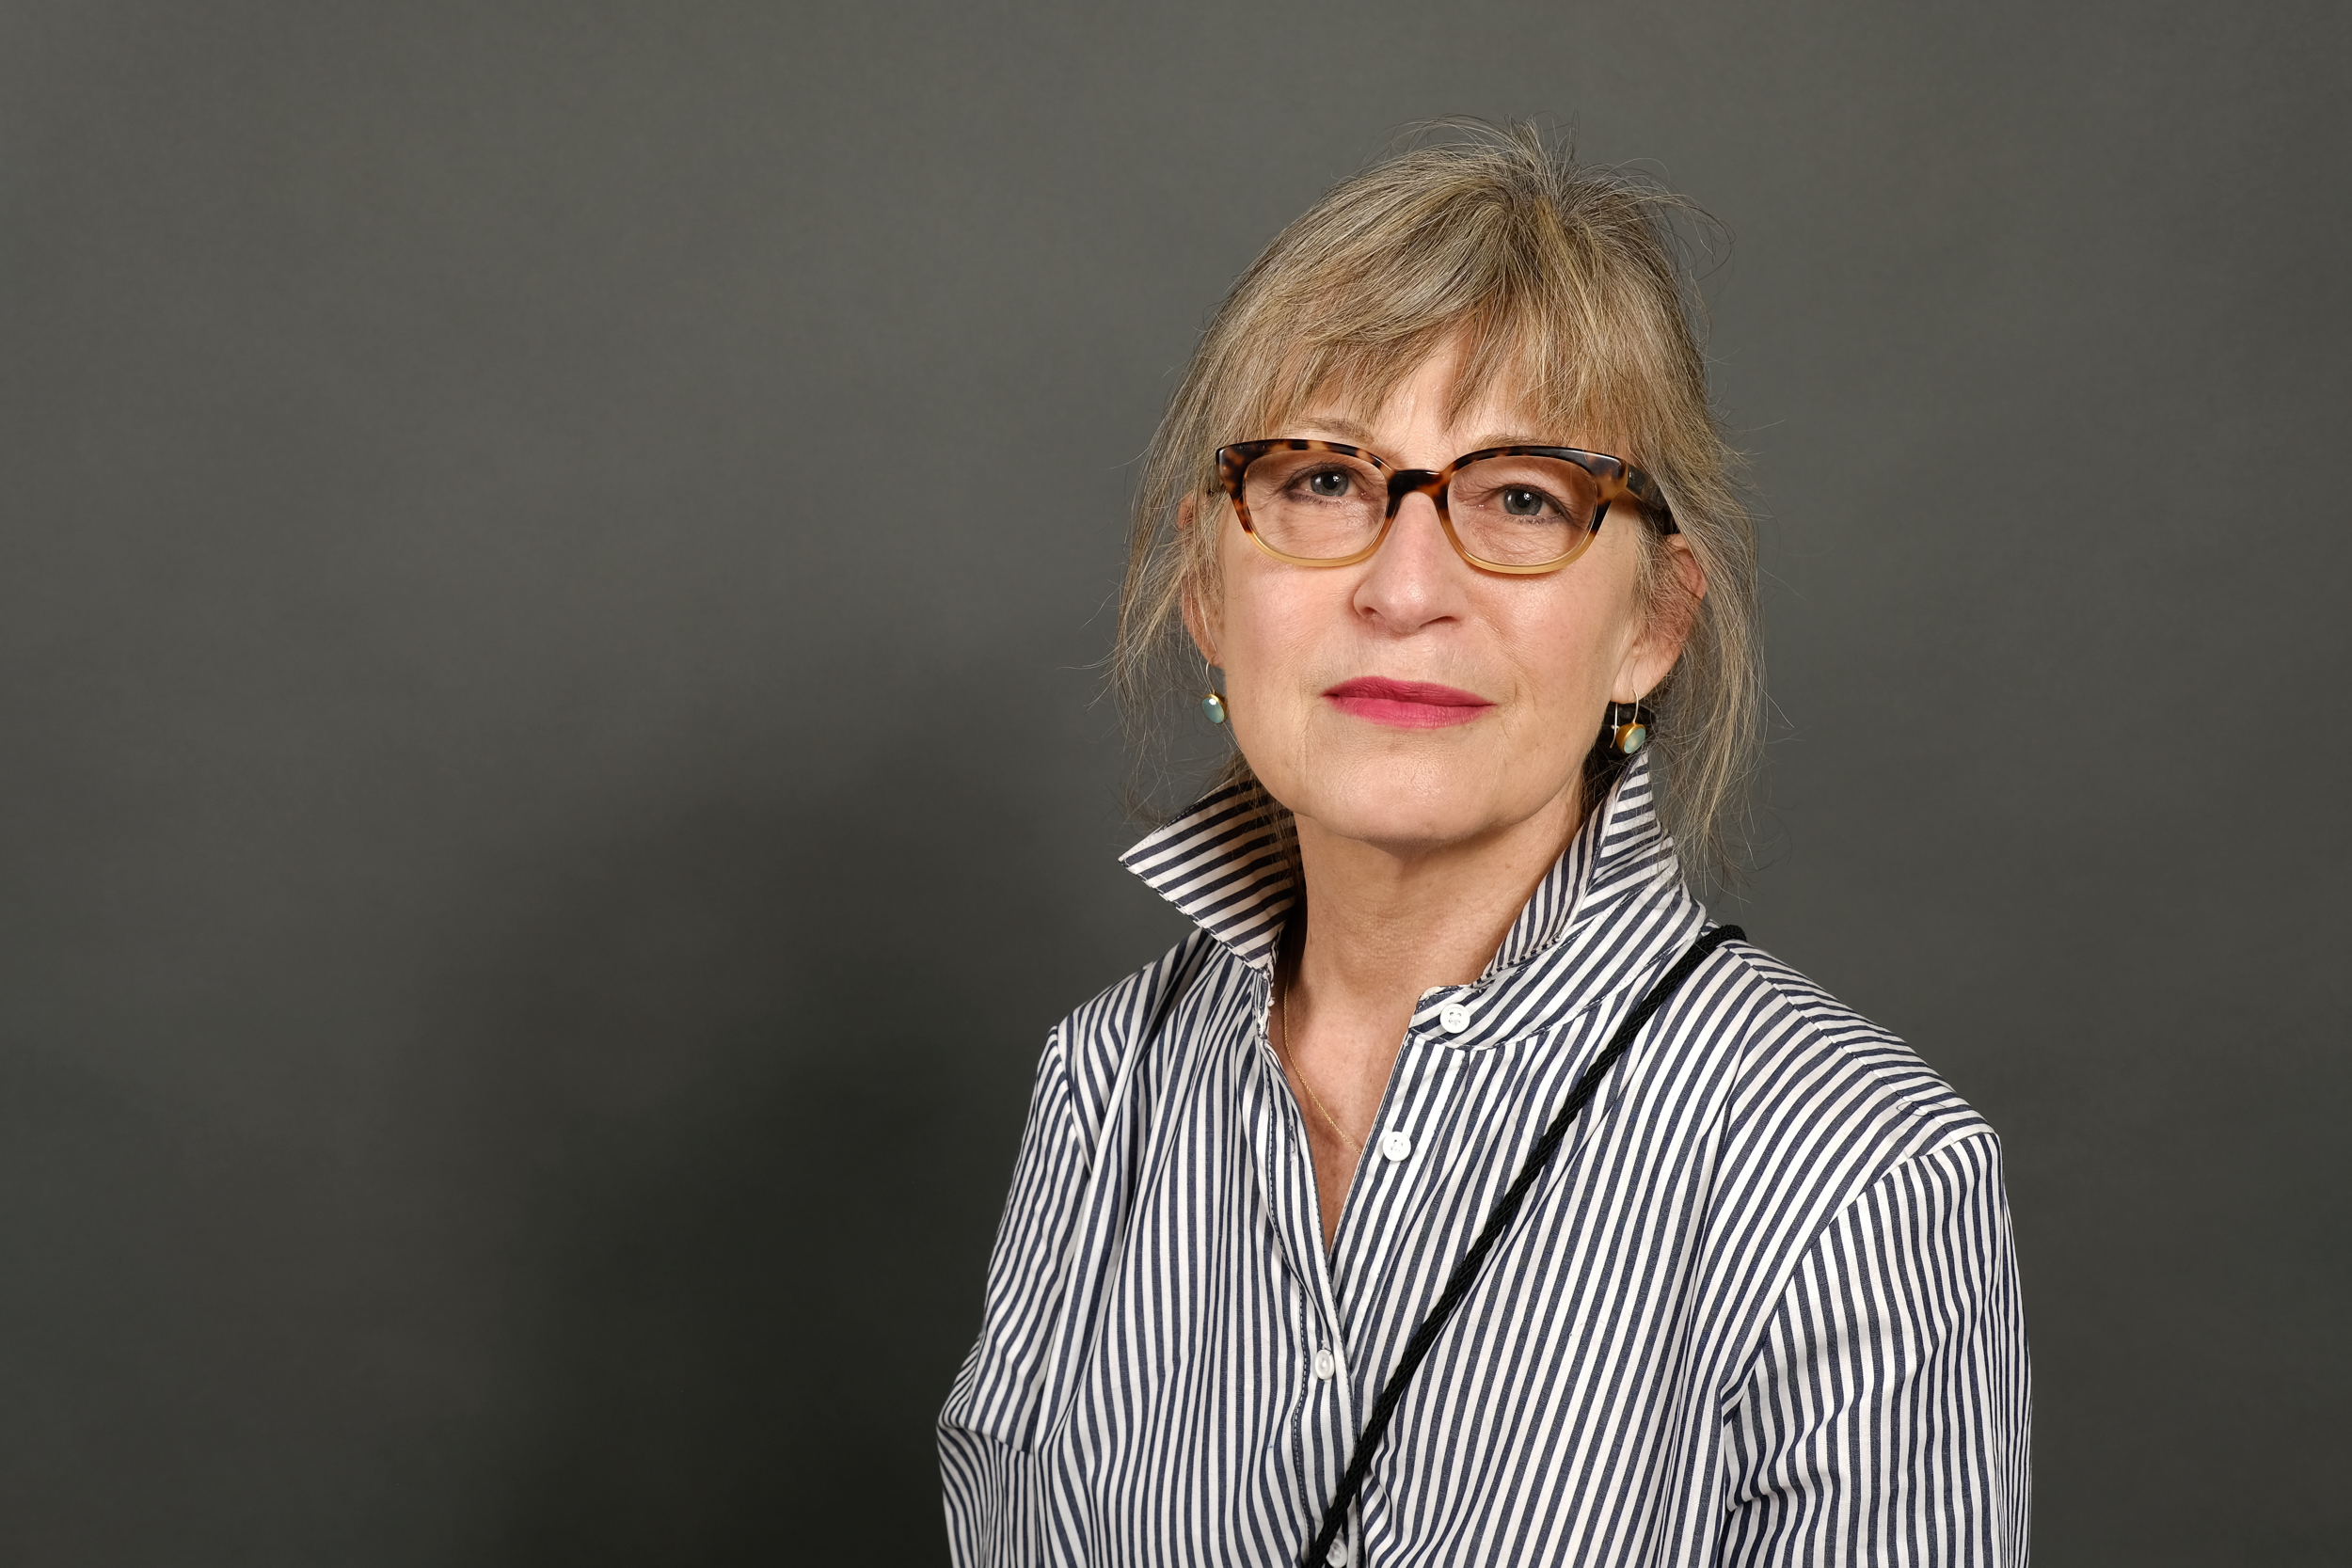 Janet Webber